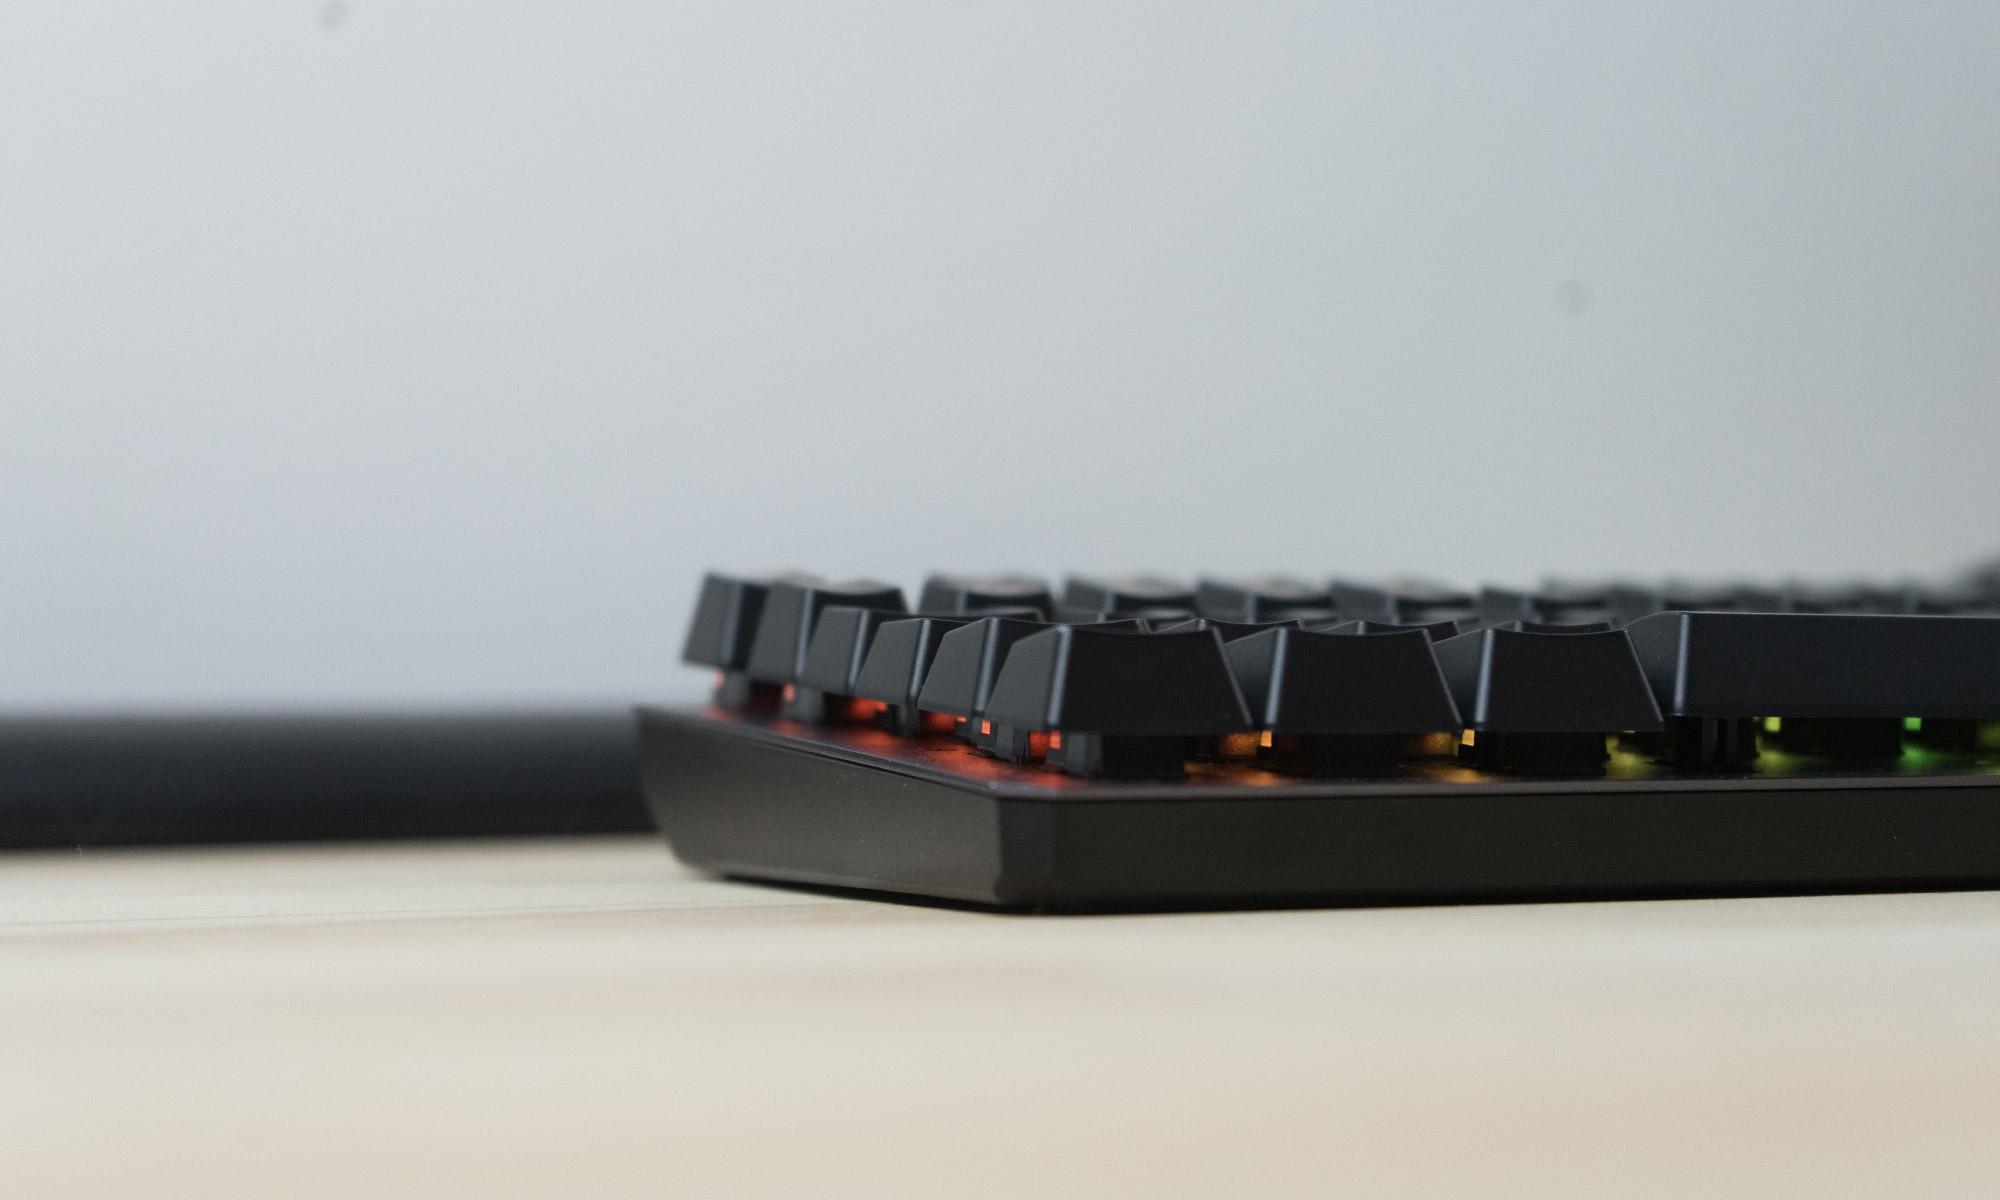 asus clavier tuf k7